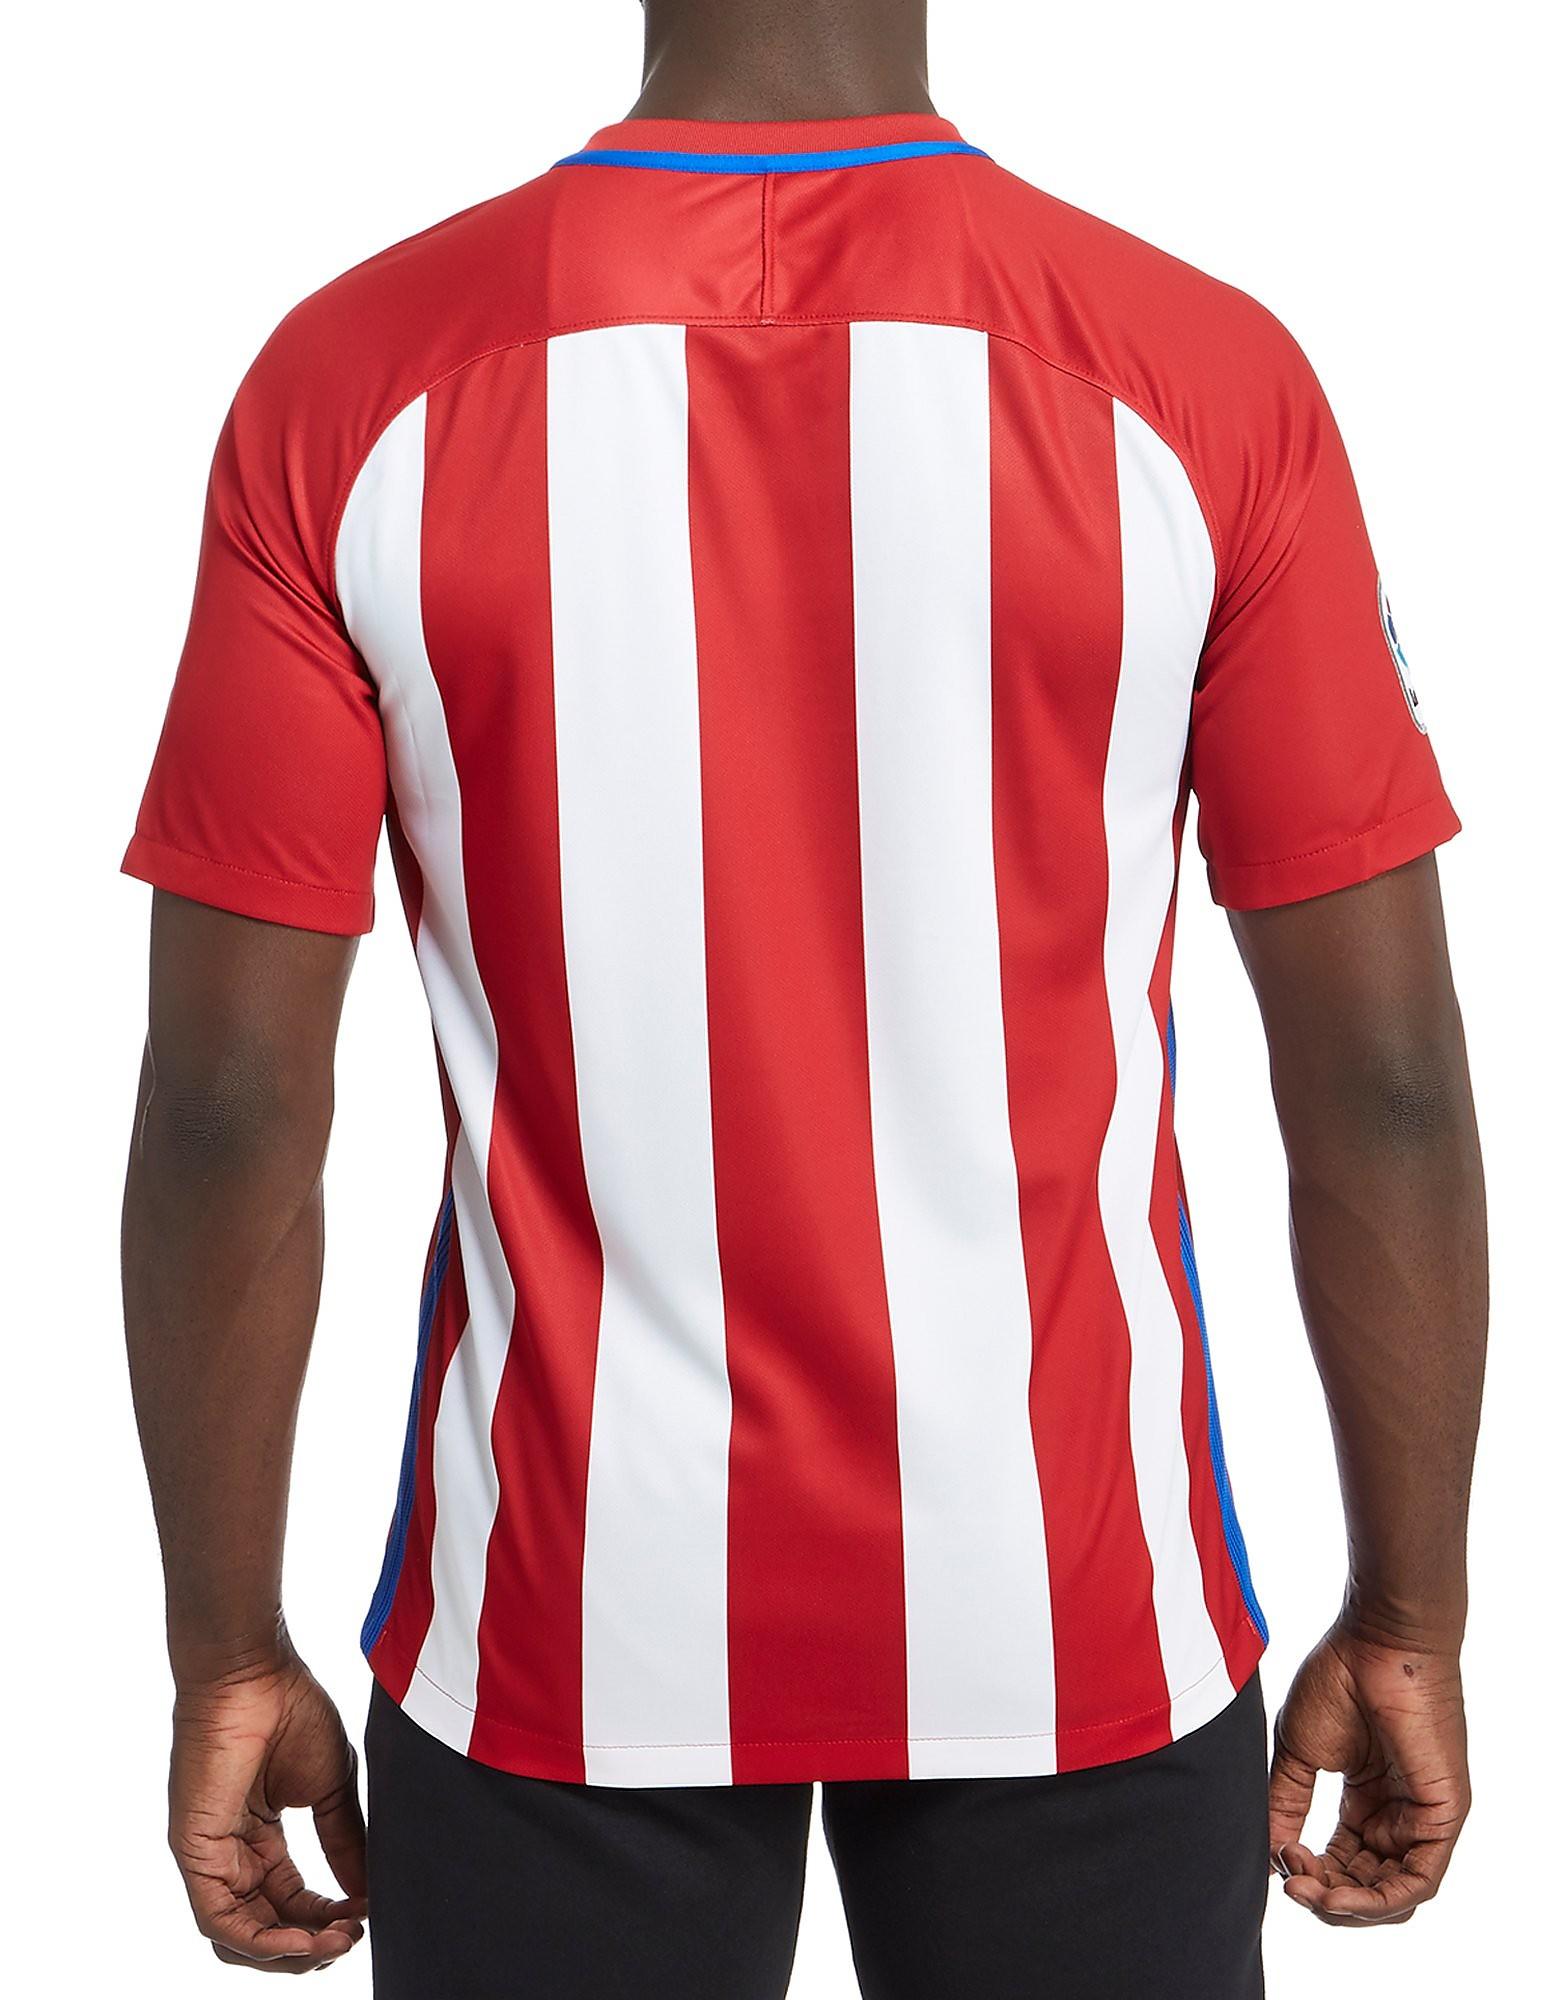 Nike Atletico Madrid 2016/17 Home Shirt